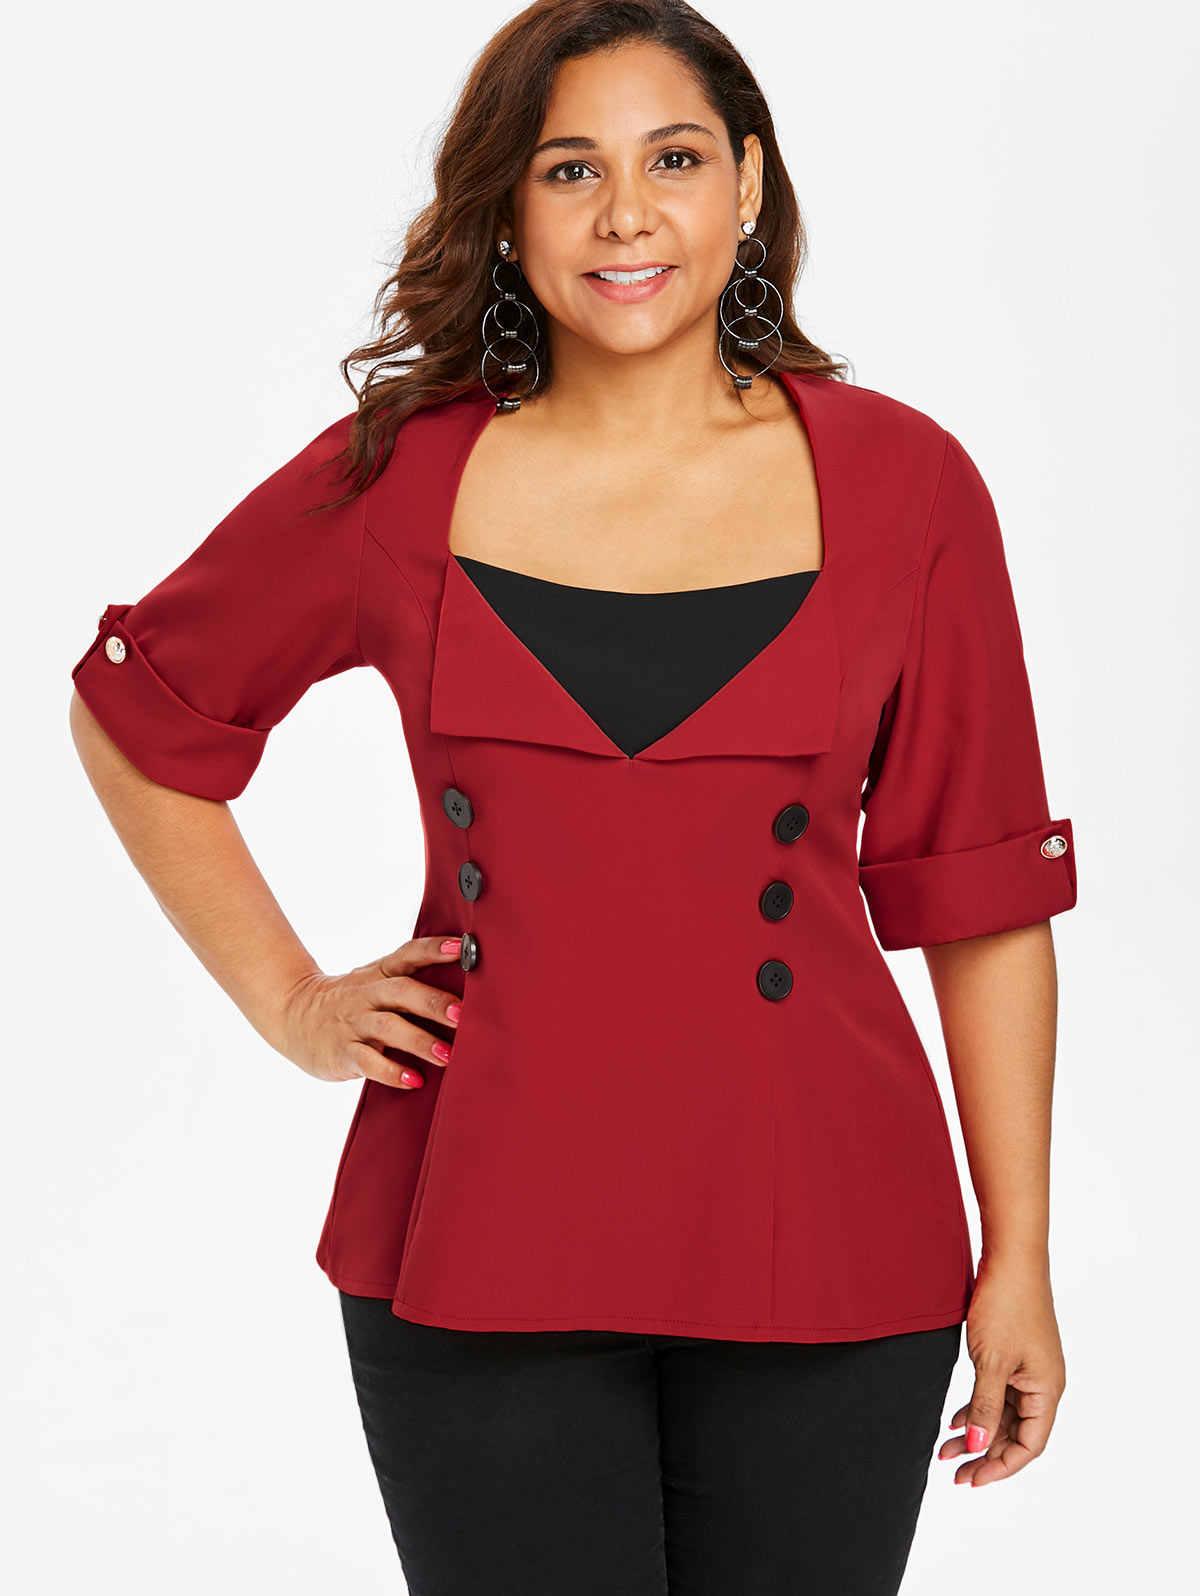 4399b174b57e4e ... Wipalo Women Plus Size Two Tone Dip Hem Blouse Buttons Back Criss Cross  High Low Shirts ...